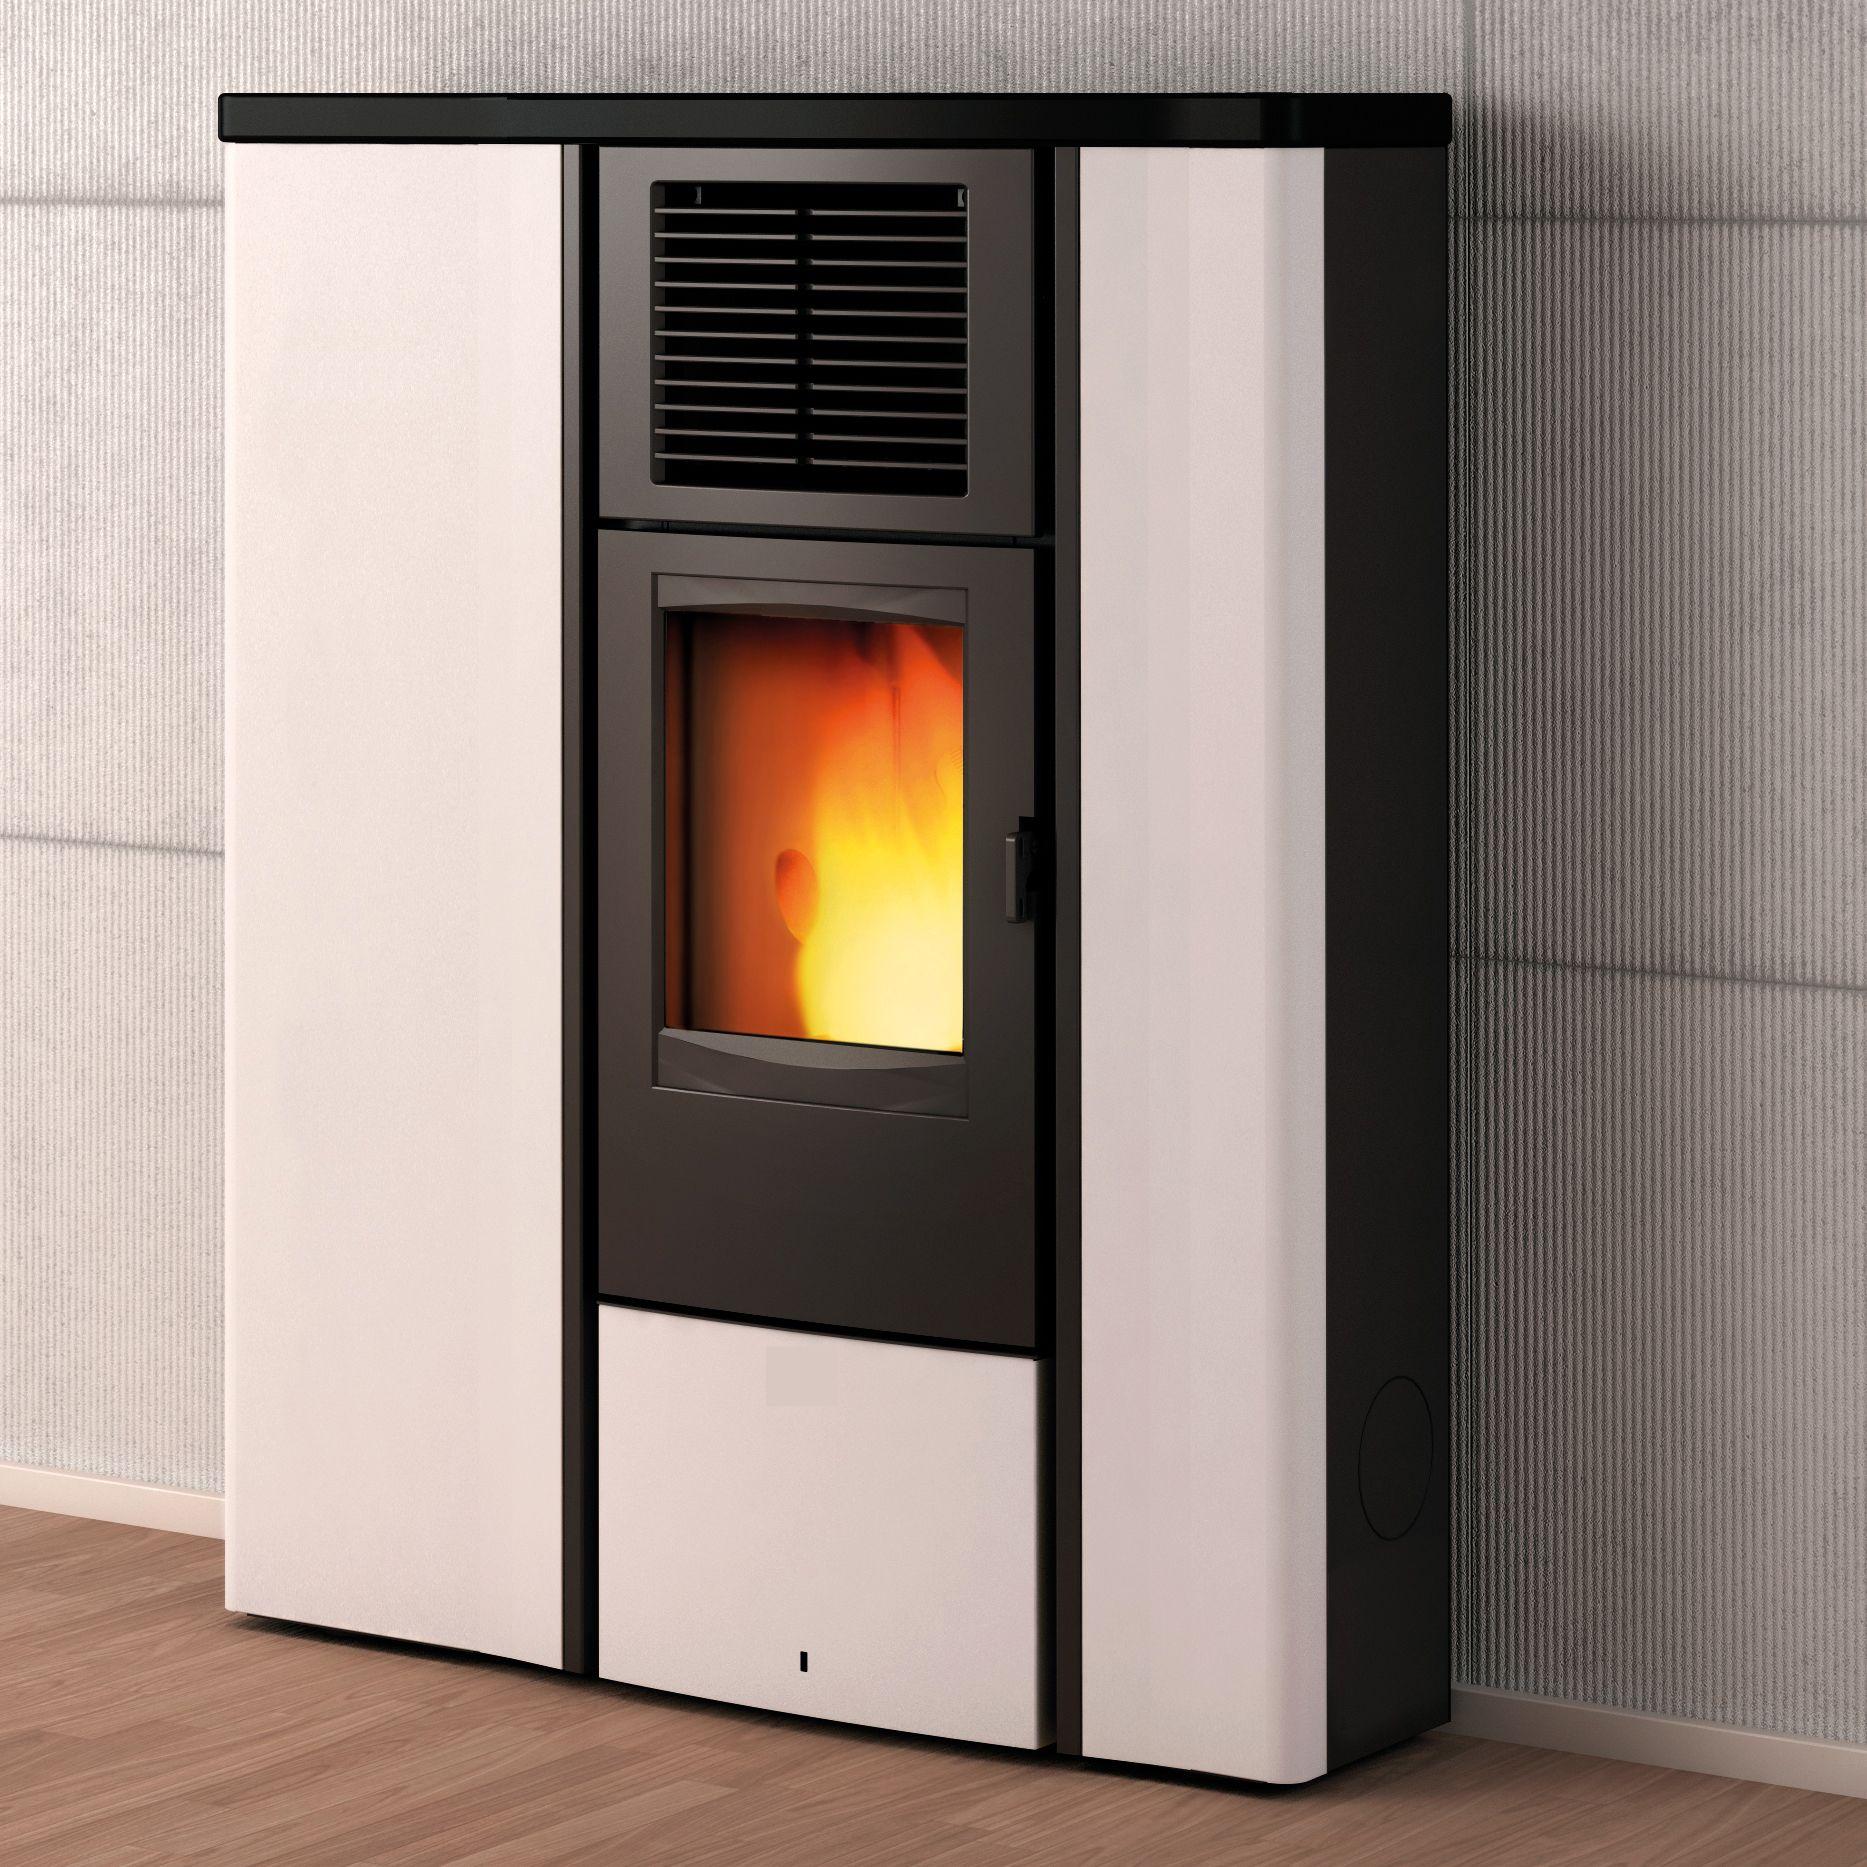 westminster pelletofen po 90 8 5 kw weiss mit schwarzem. Black Bedroom Furniture Sets. Home Design Ideas